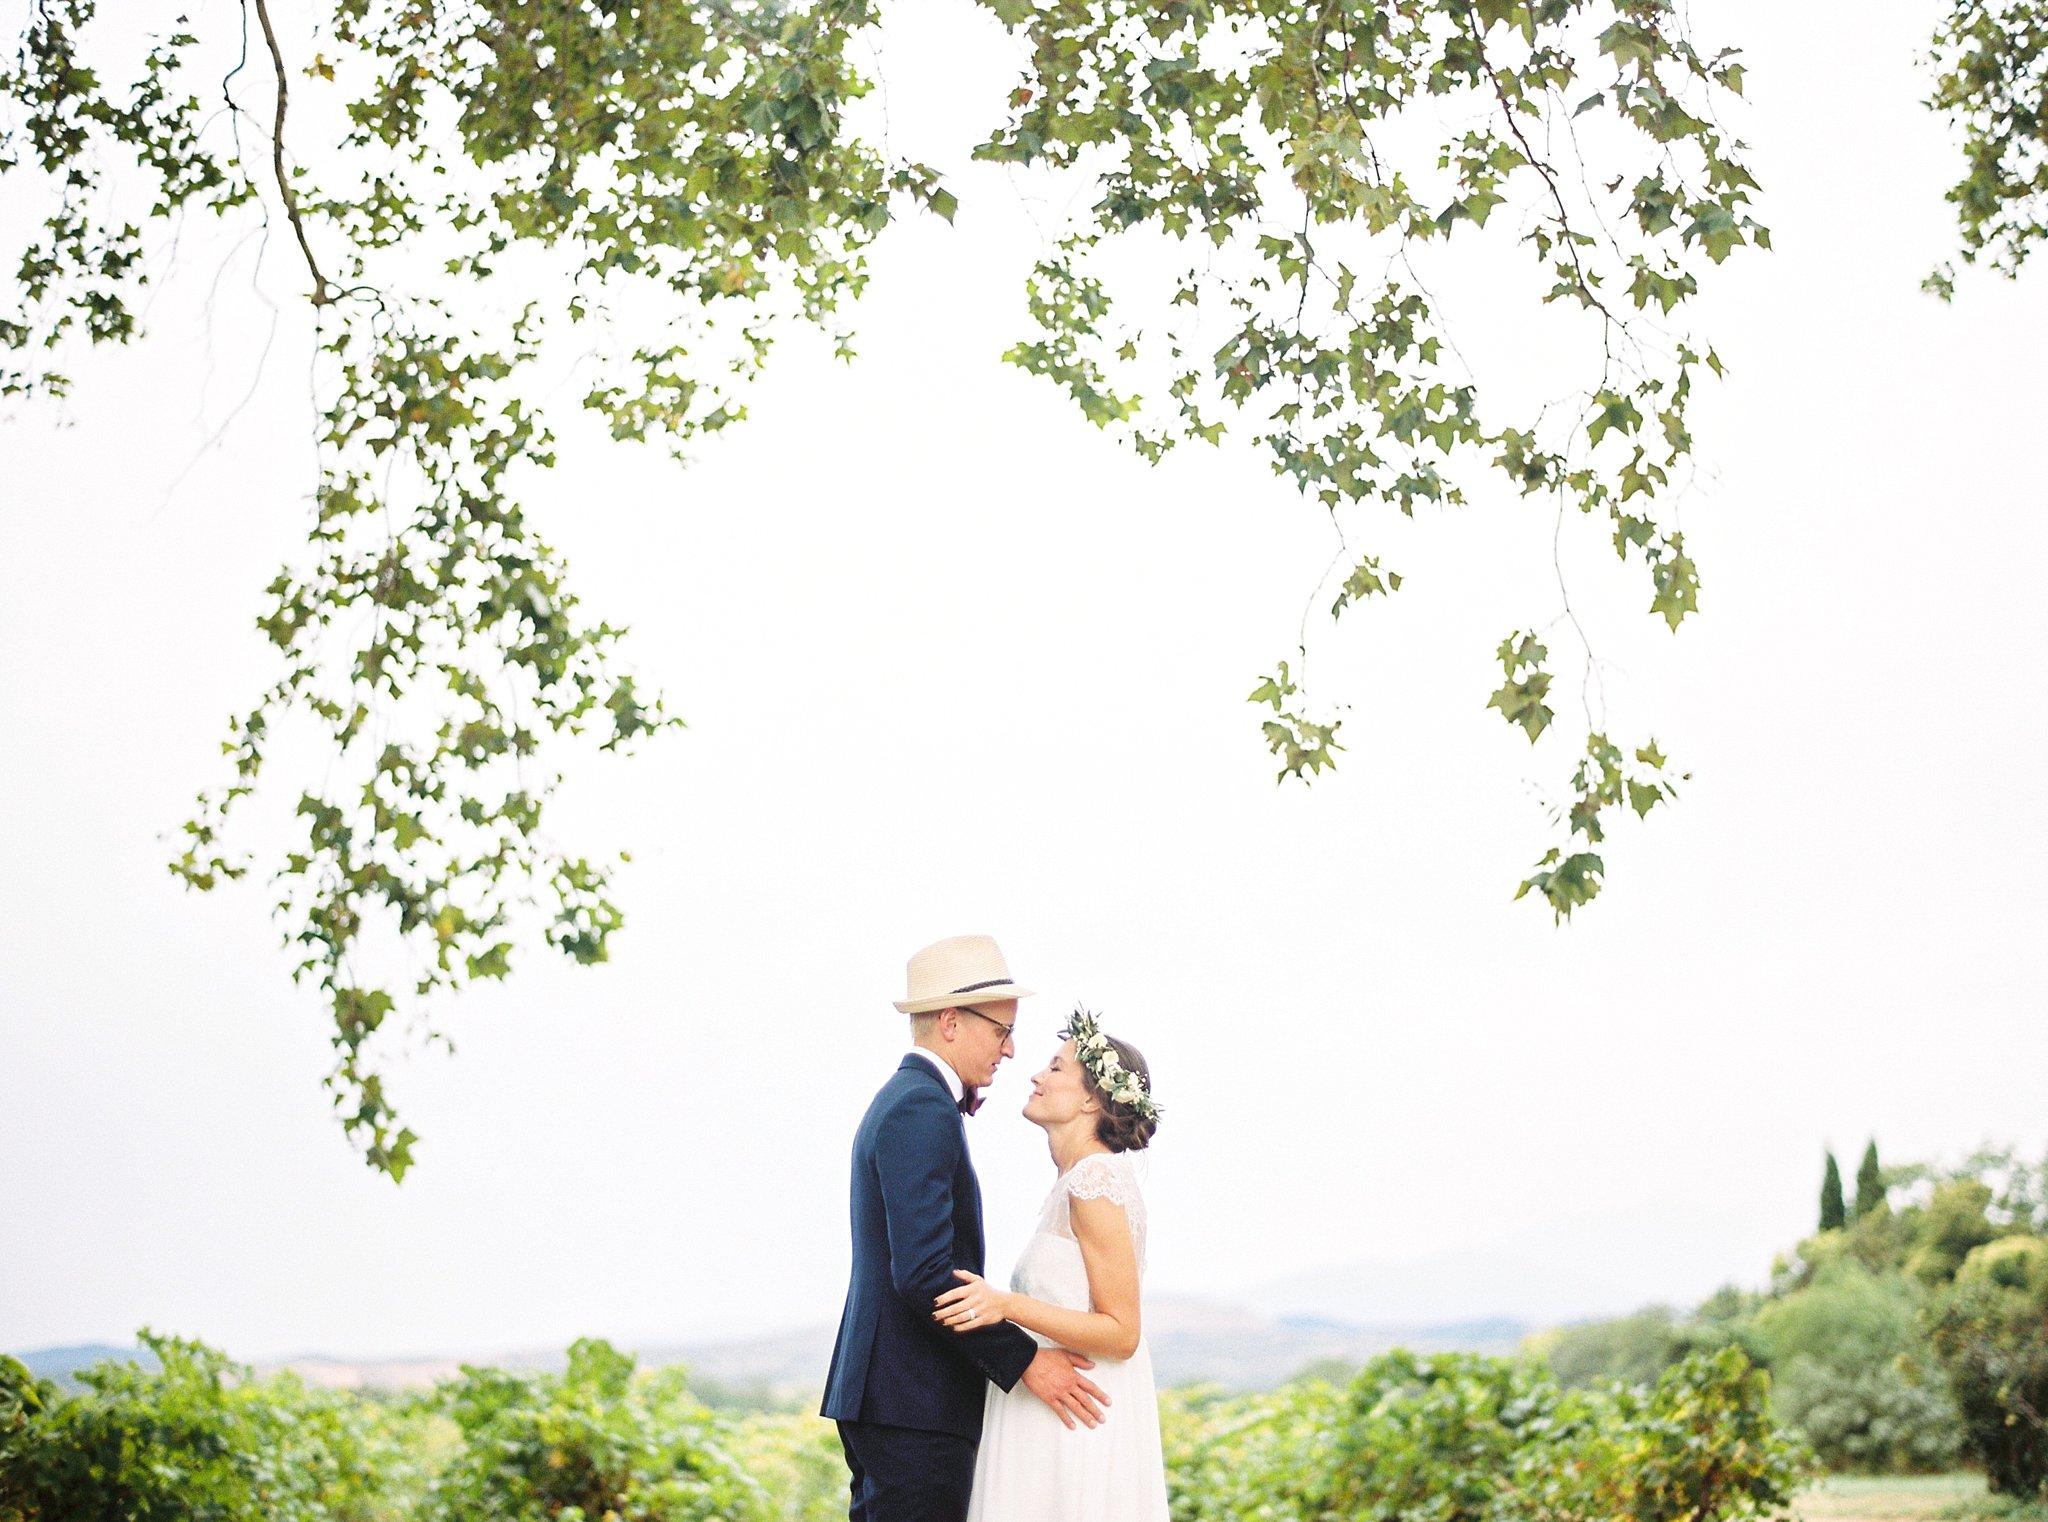 Wedding Photographer Perpignan - Château Las Collas Wedding - Hugo Hennequin027.jpg